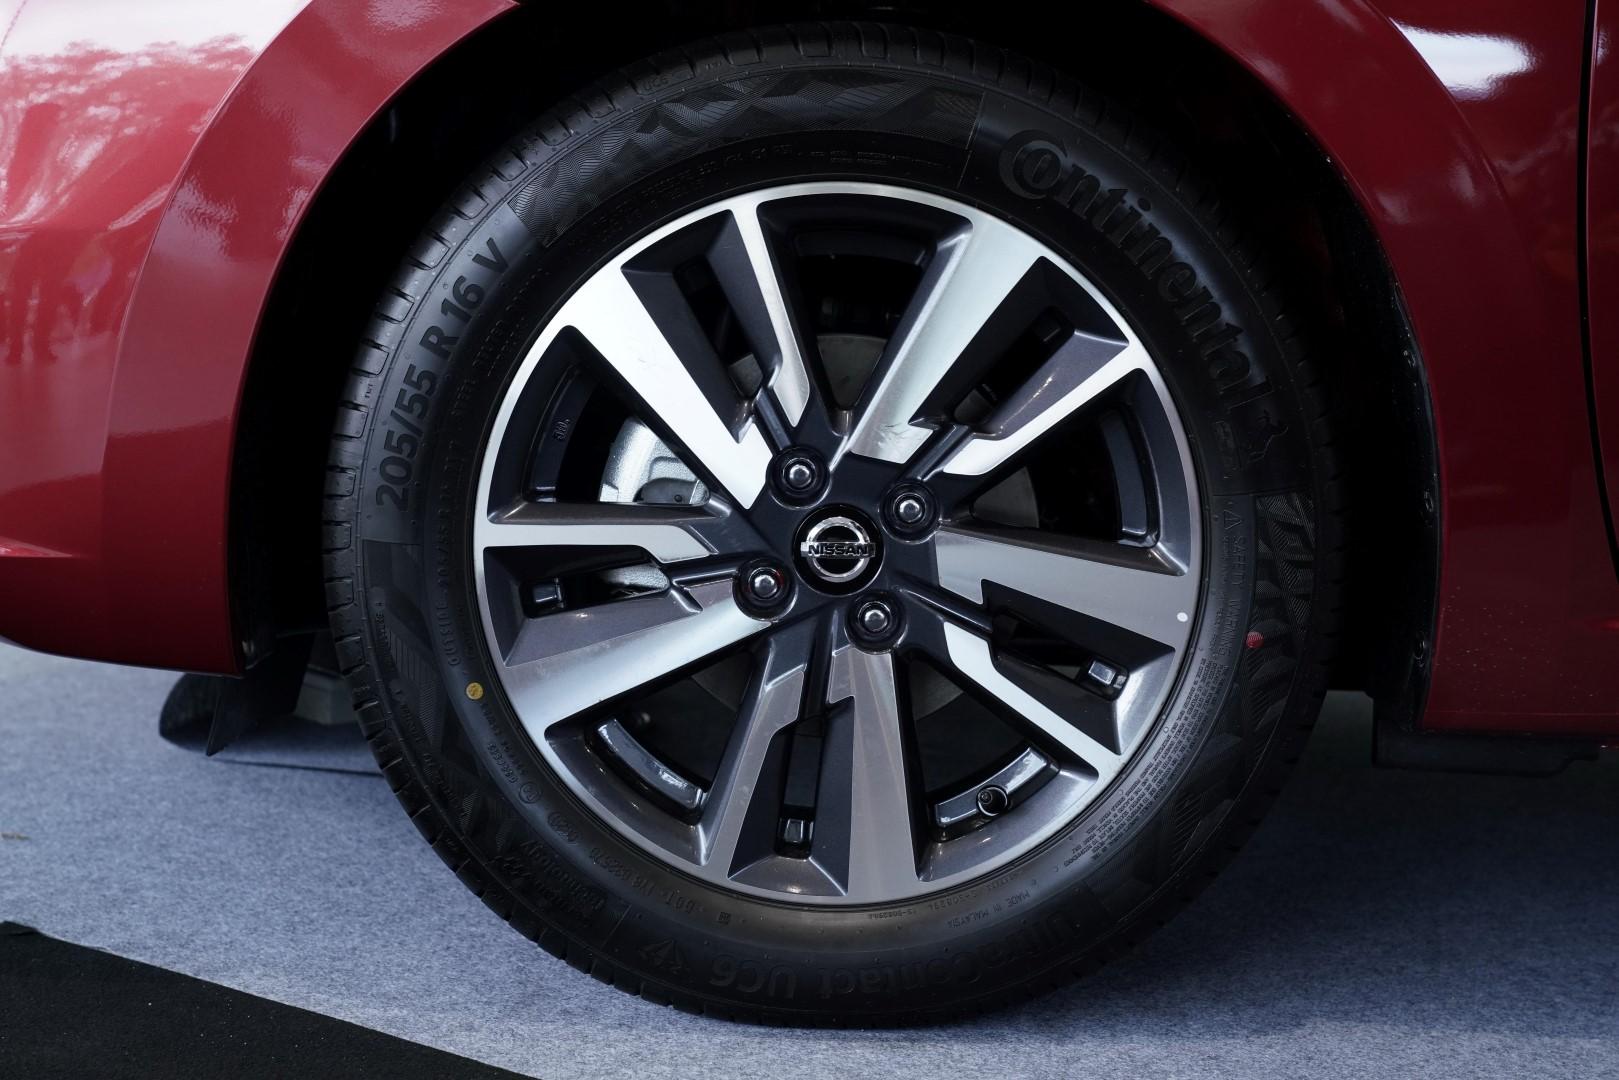 2020 Nissan Almera Rims